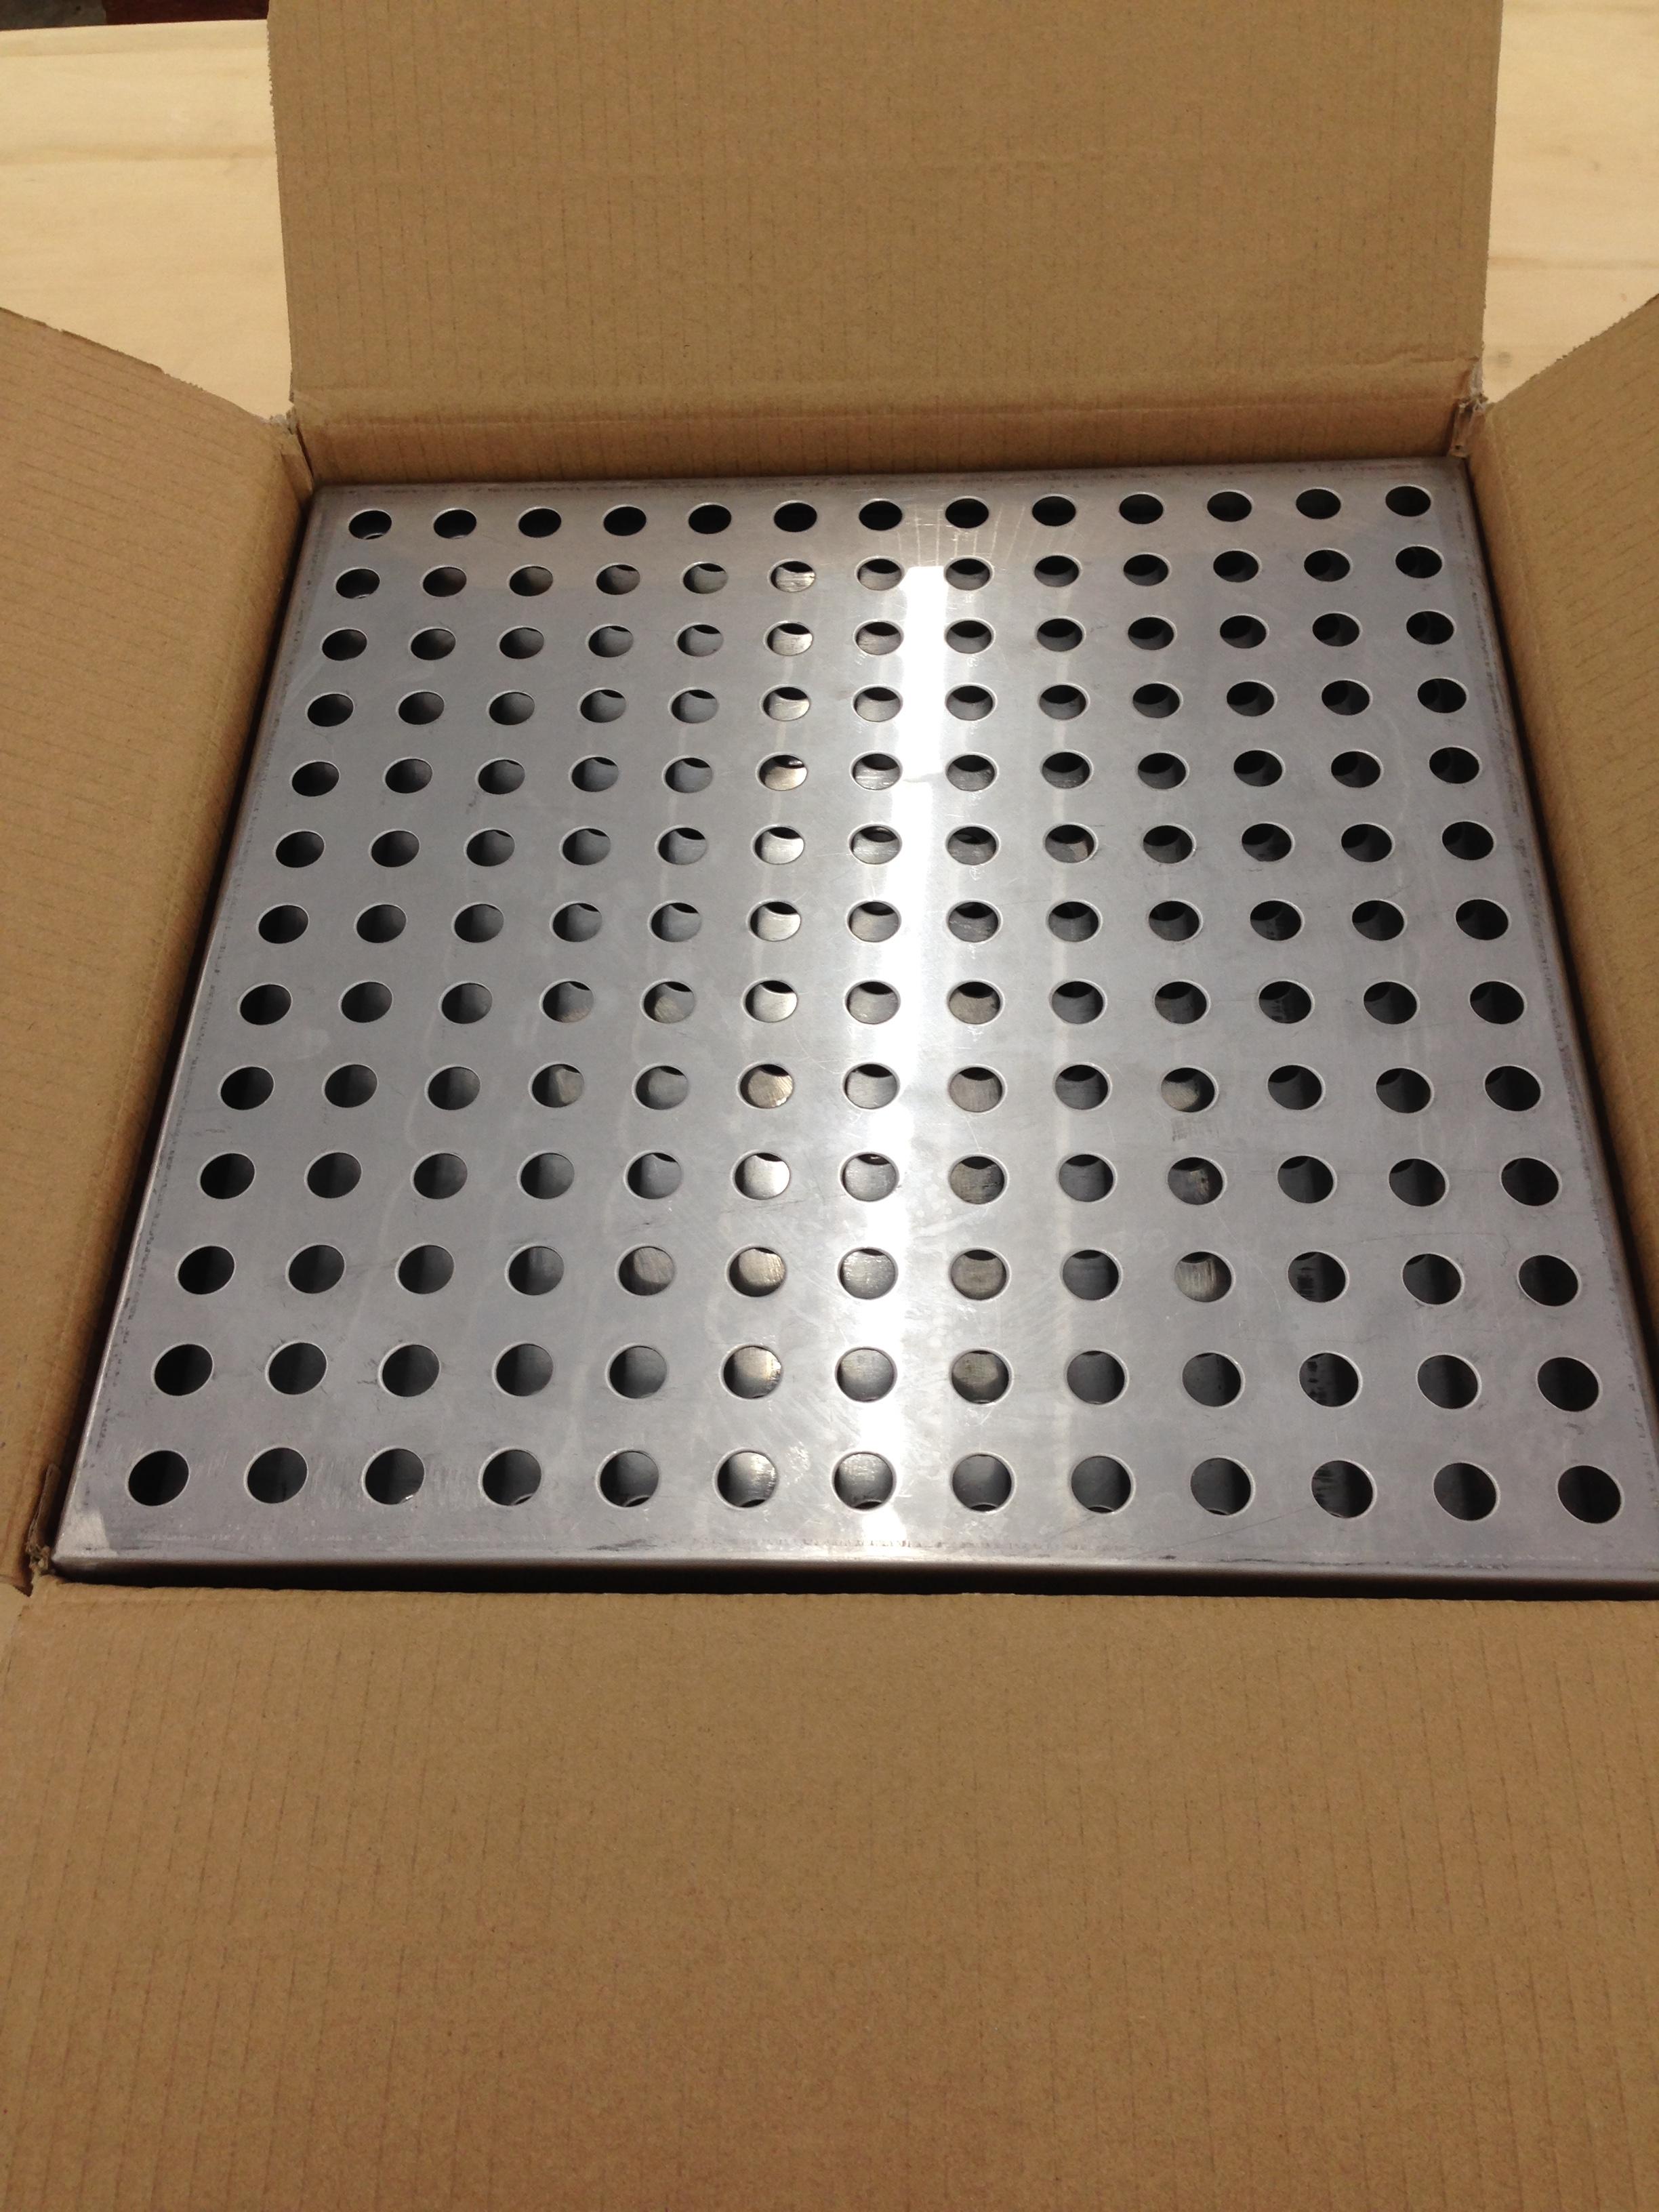 sorting insert box of 4.JPG?150394679706